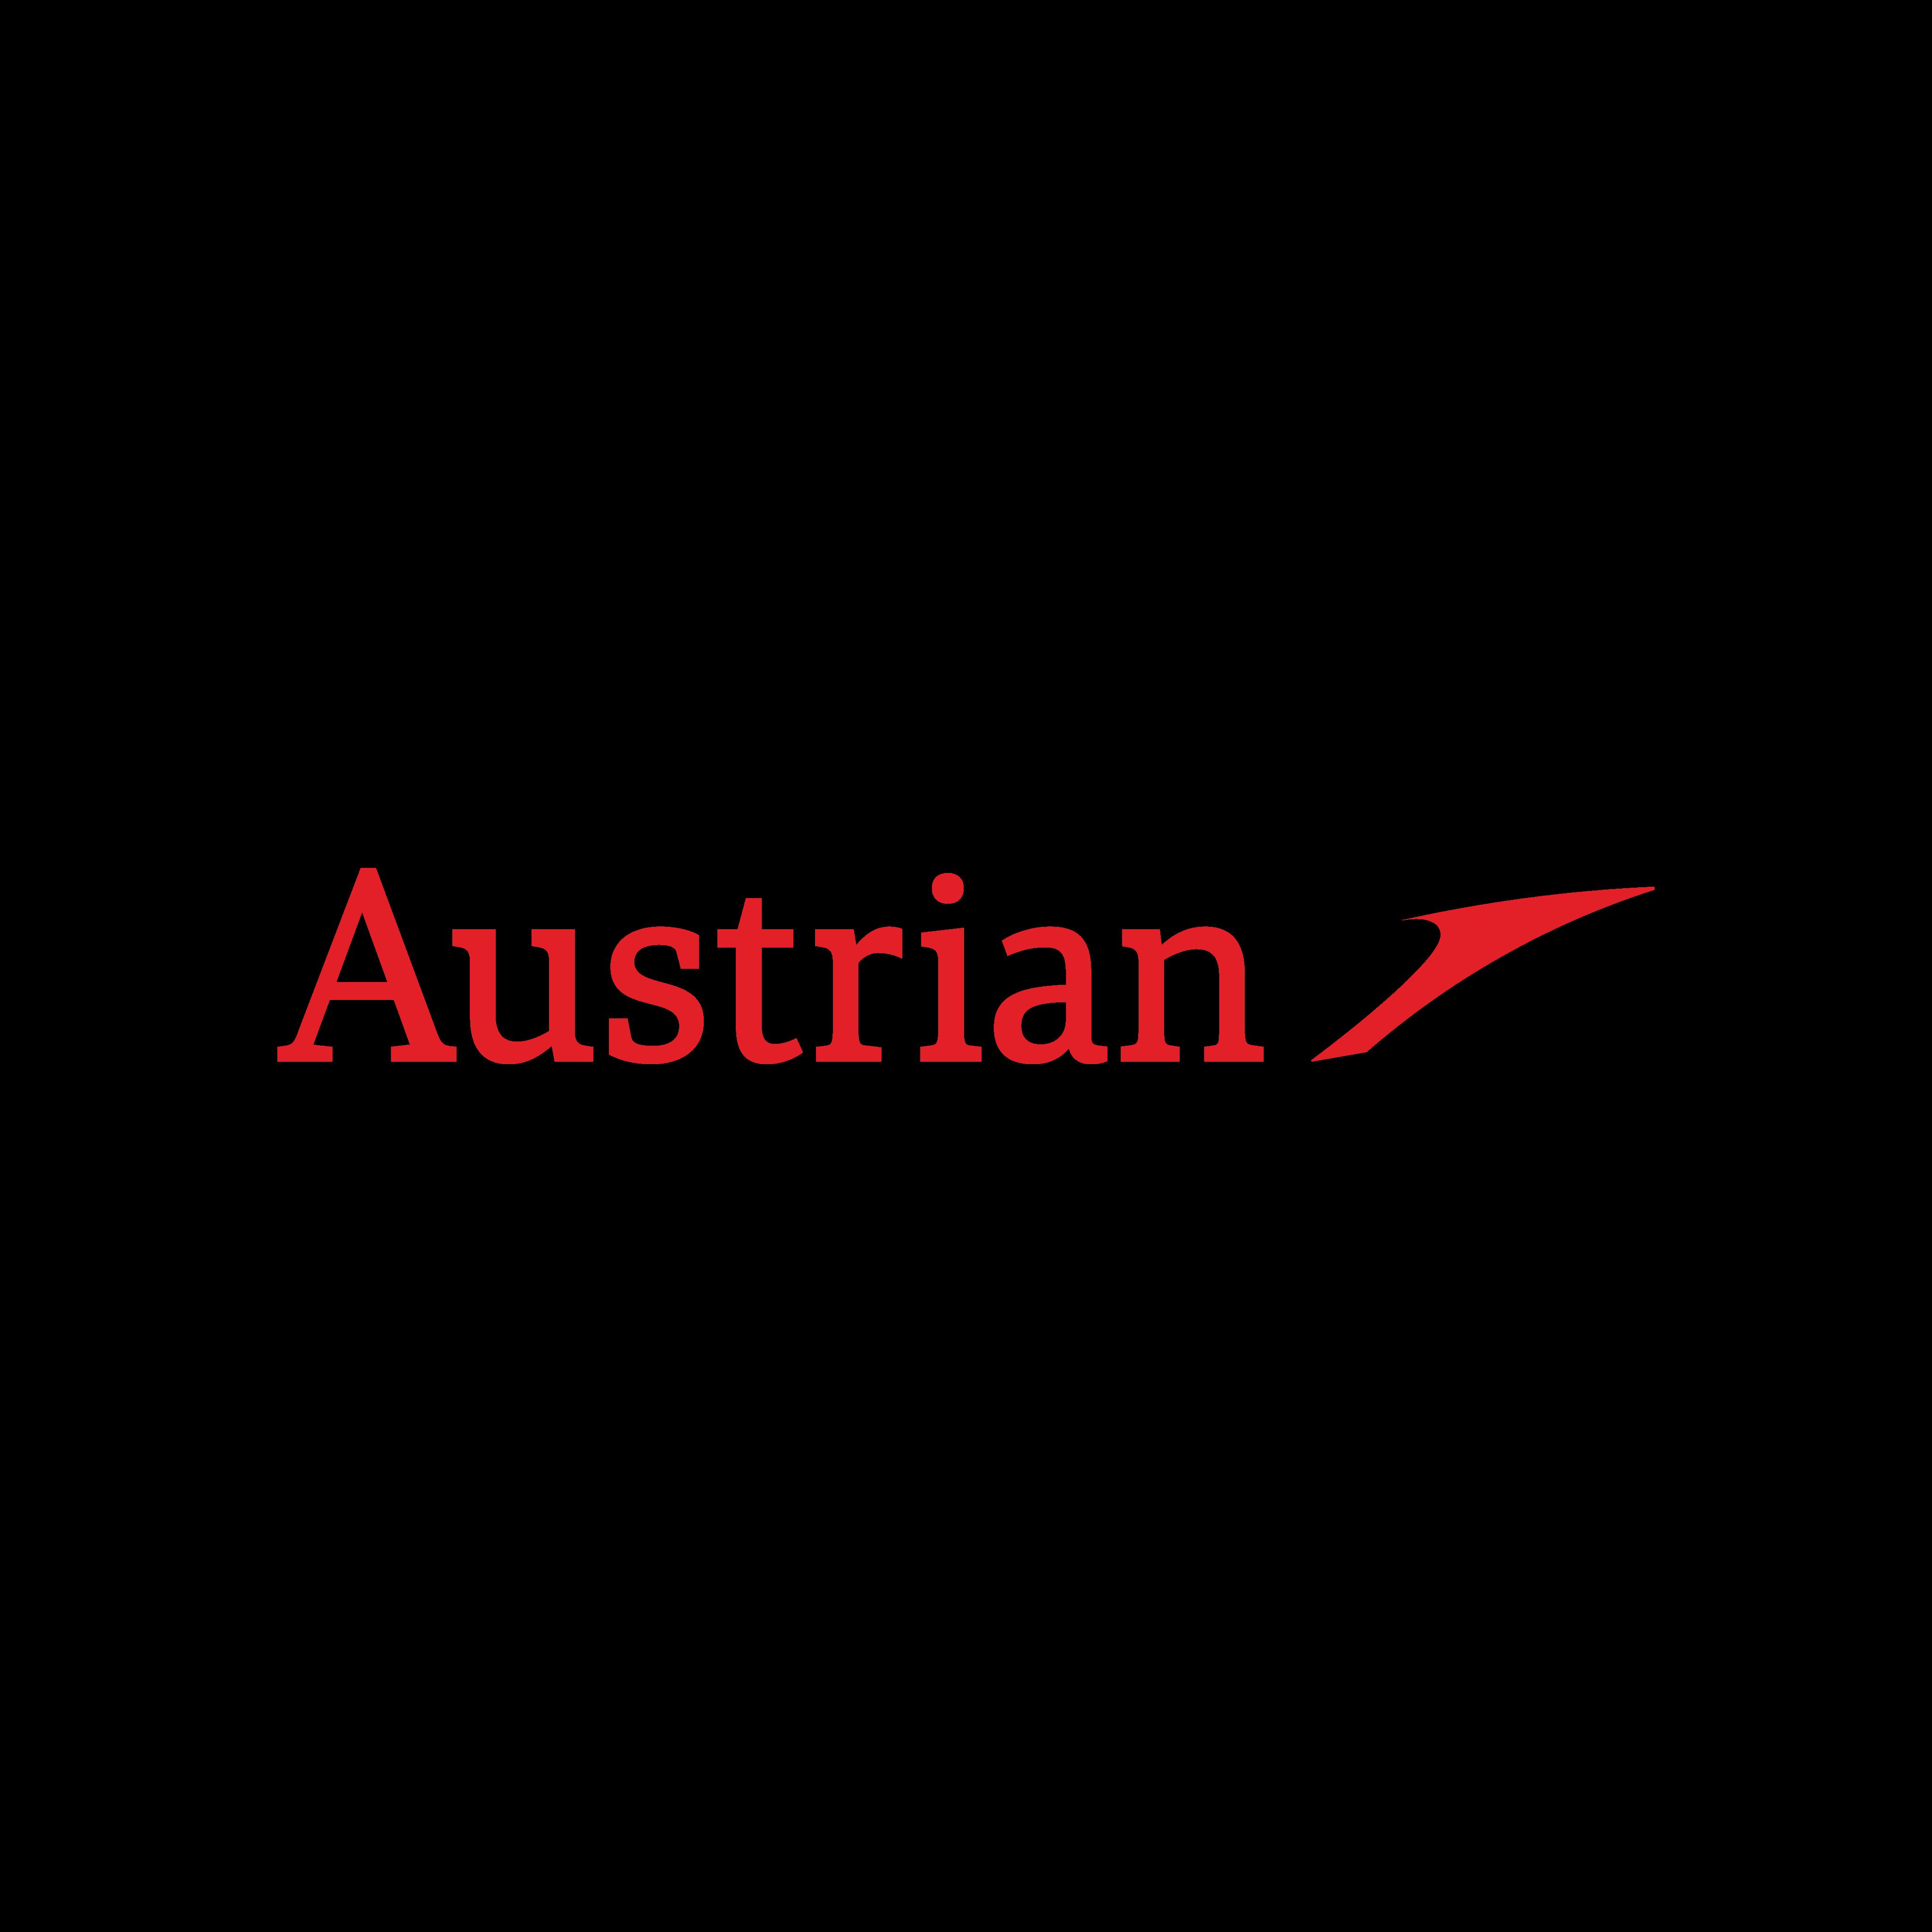 austrian airlines logo 0 - Austrian Airlines Logo